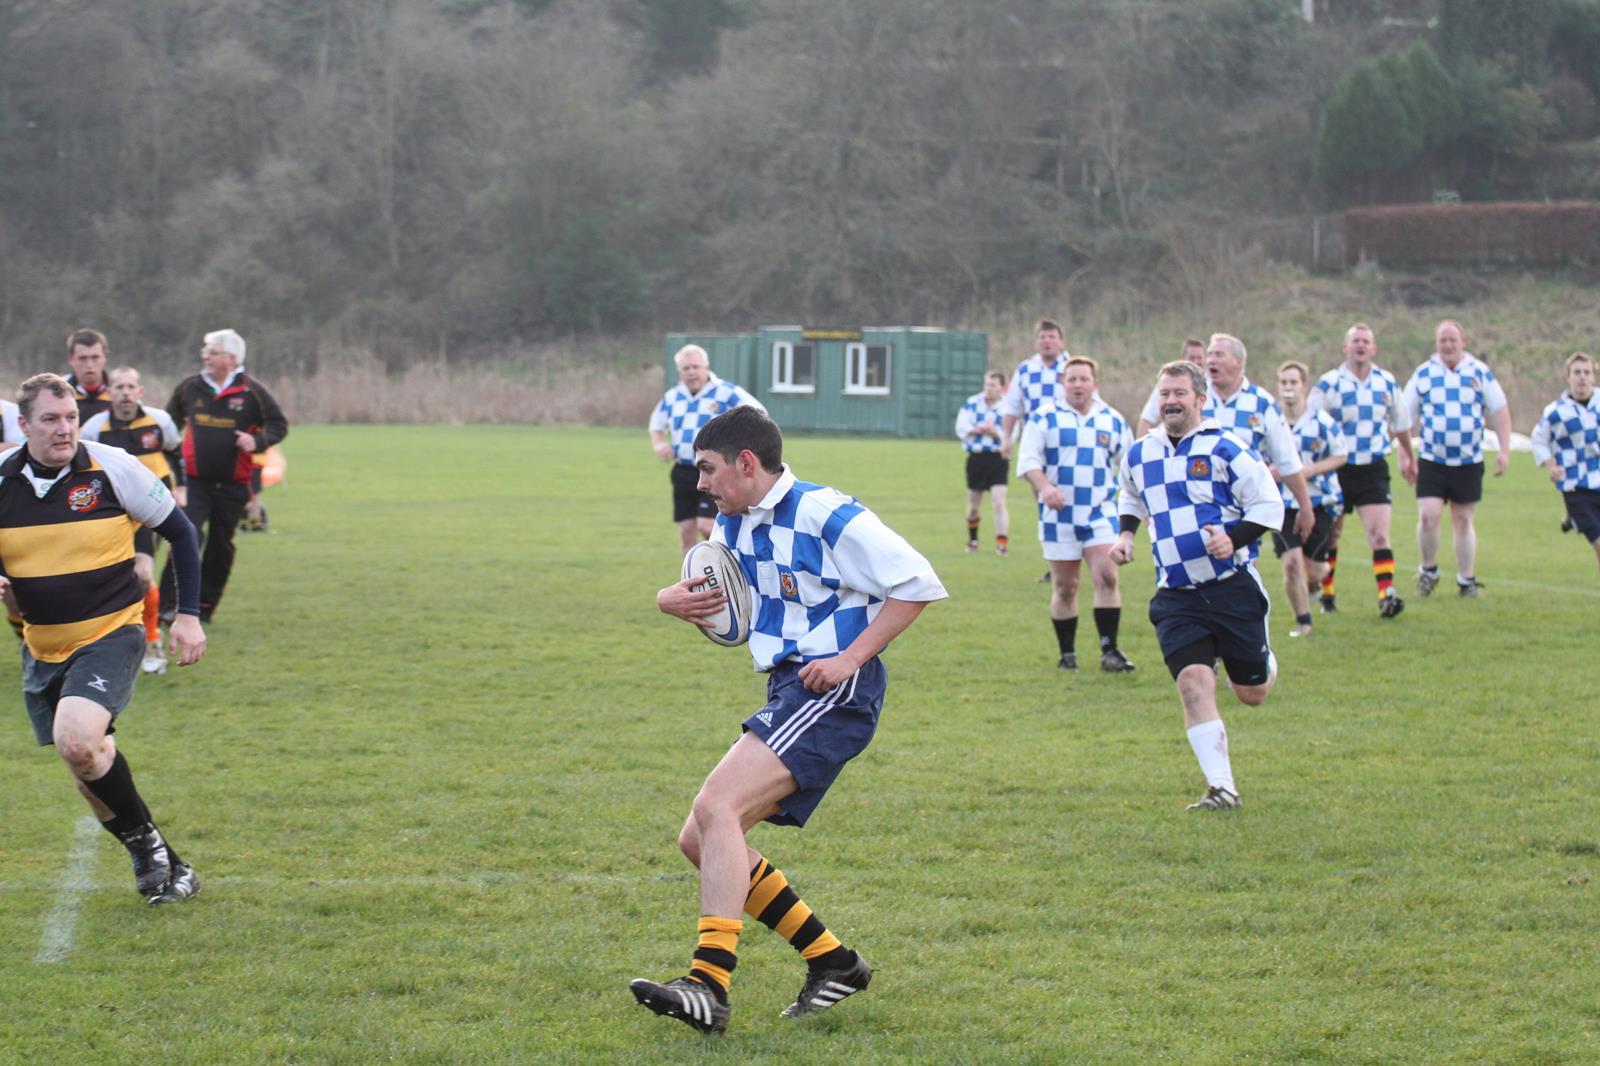 Bingley Rugby Club Function Room